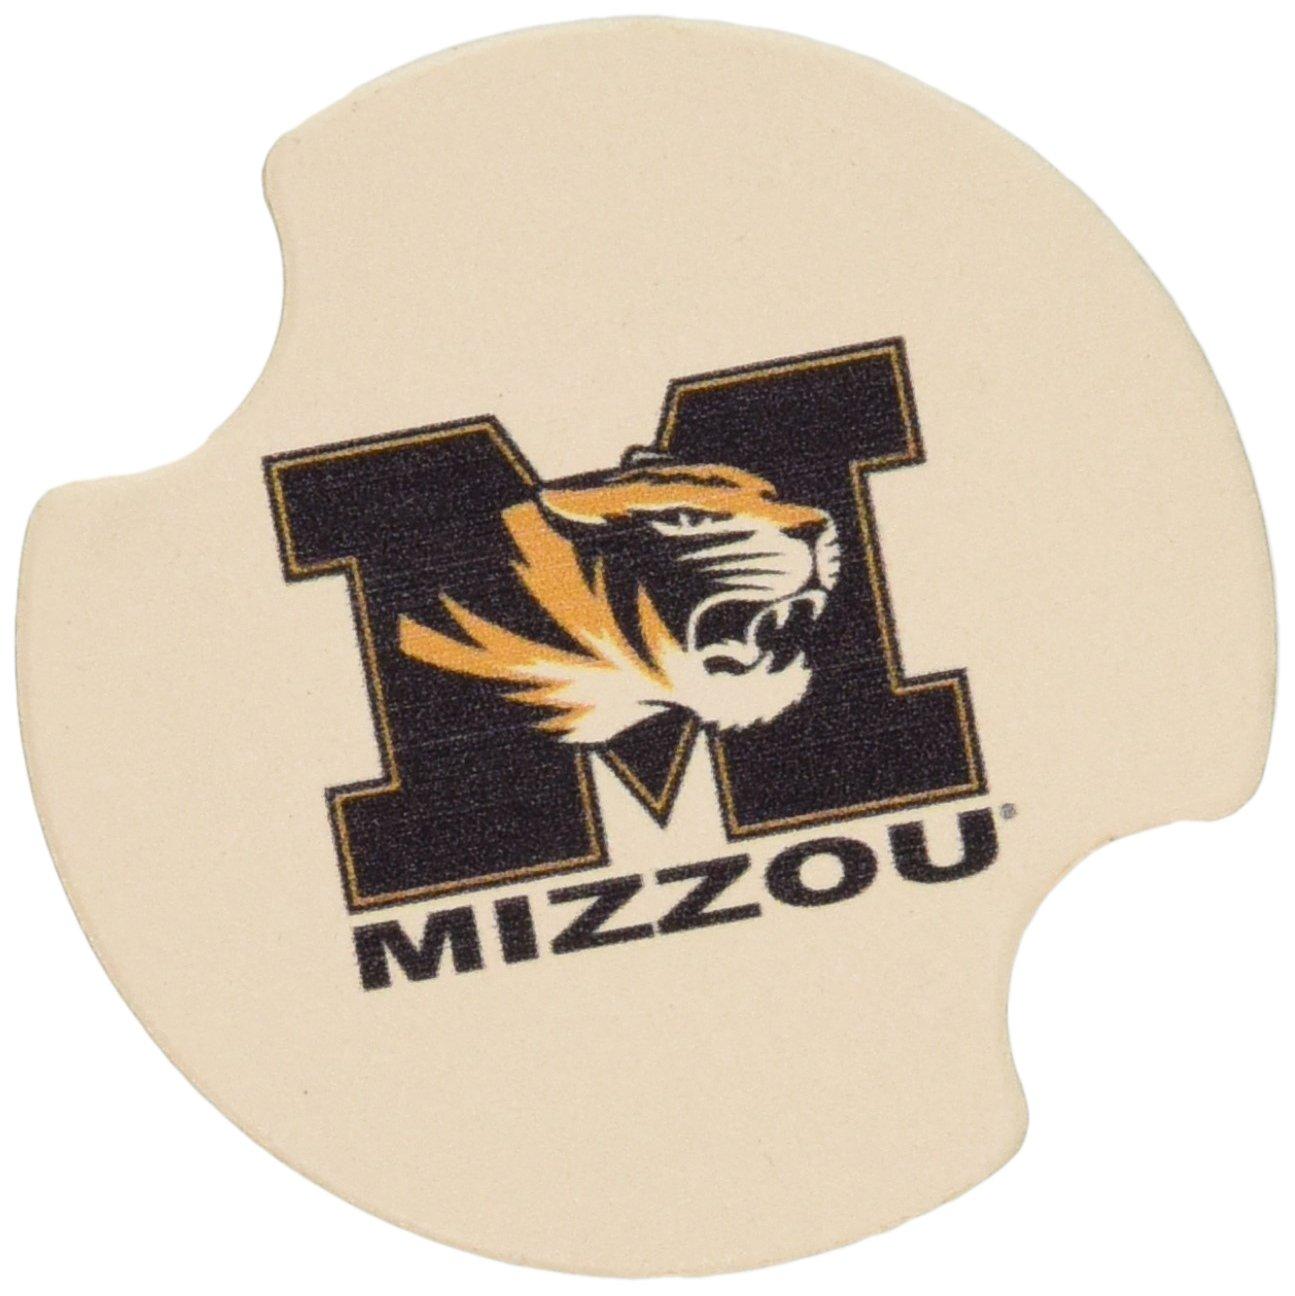 Thirstystone University of Missouri Car Cup Holder Coaster 2-Pack